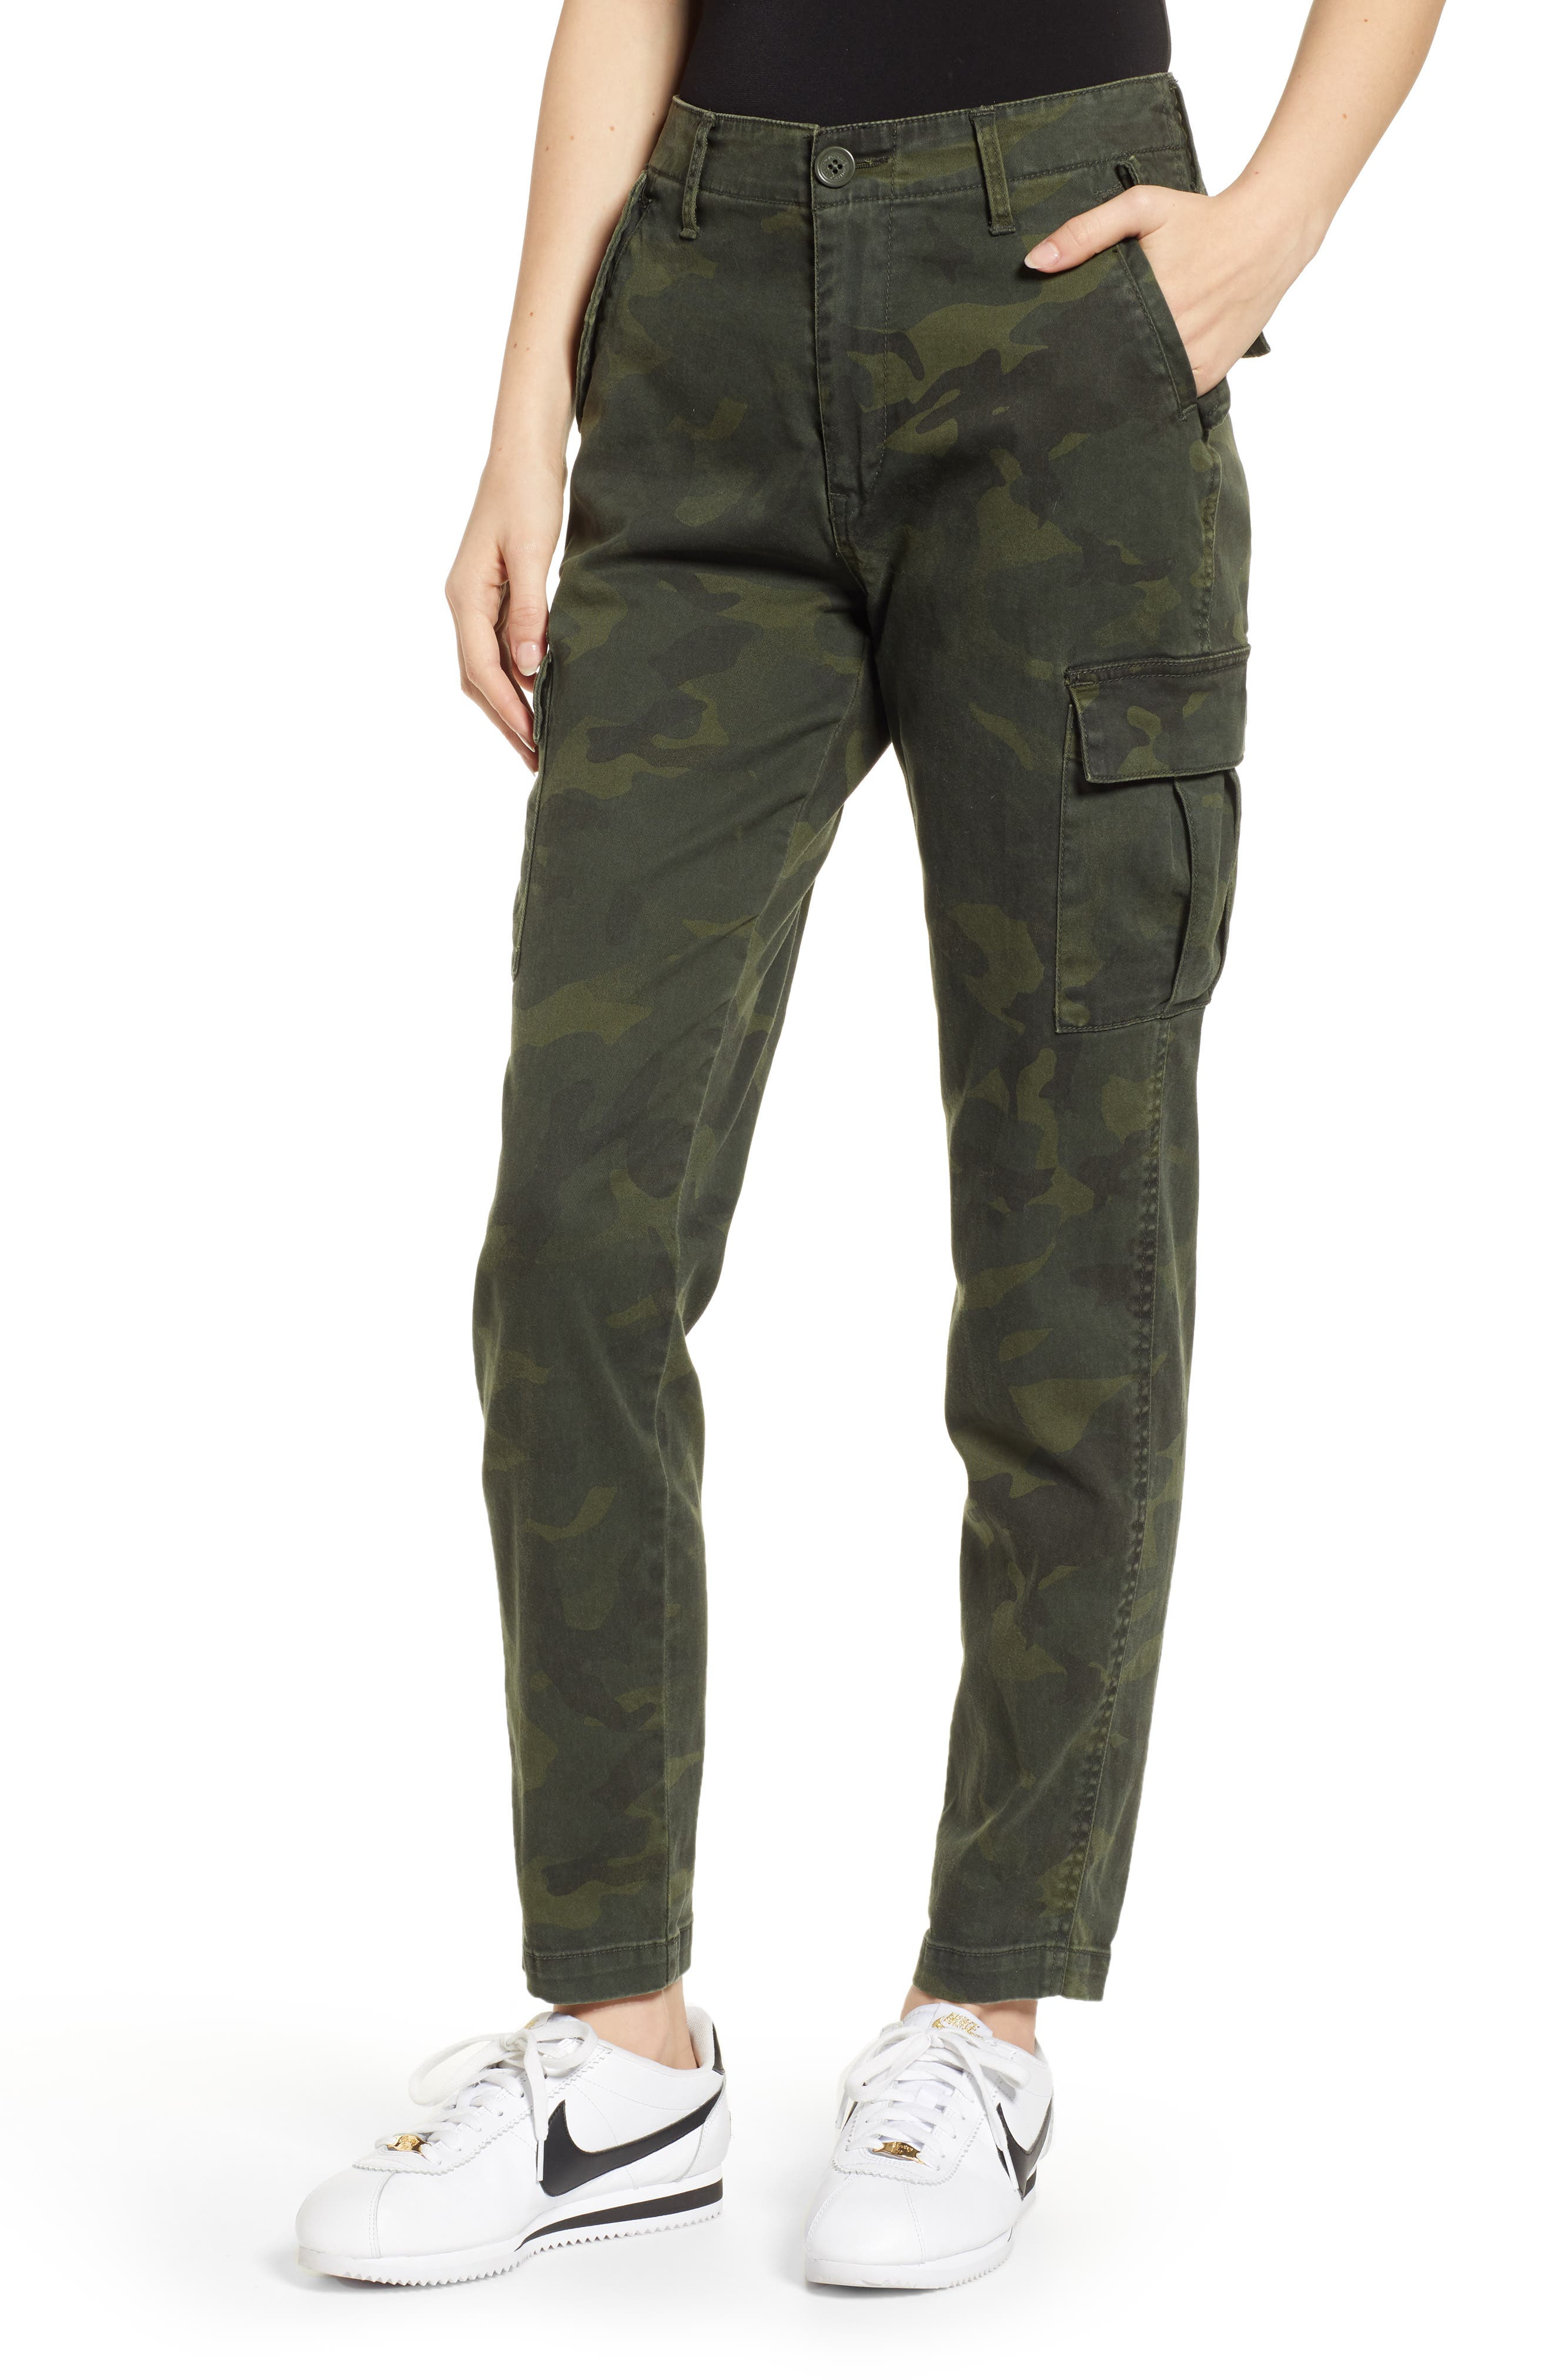 Union Bay Garner Camouflage Cargo Pants, Green